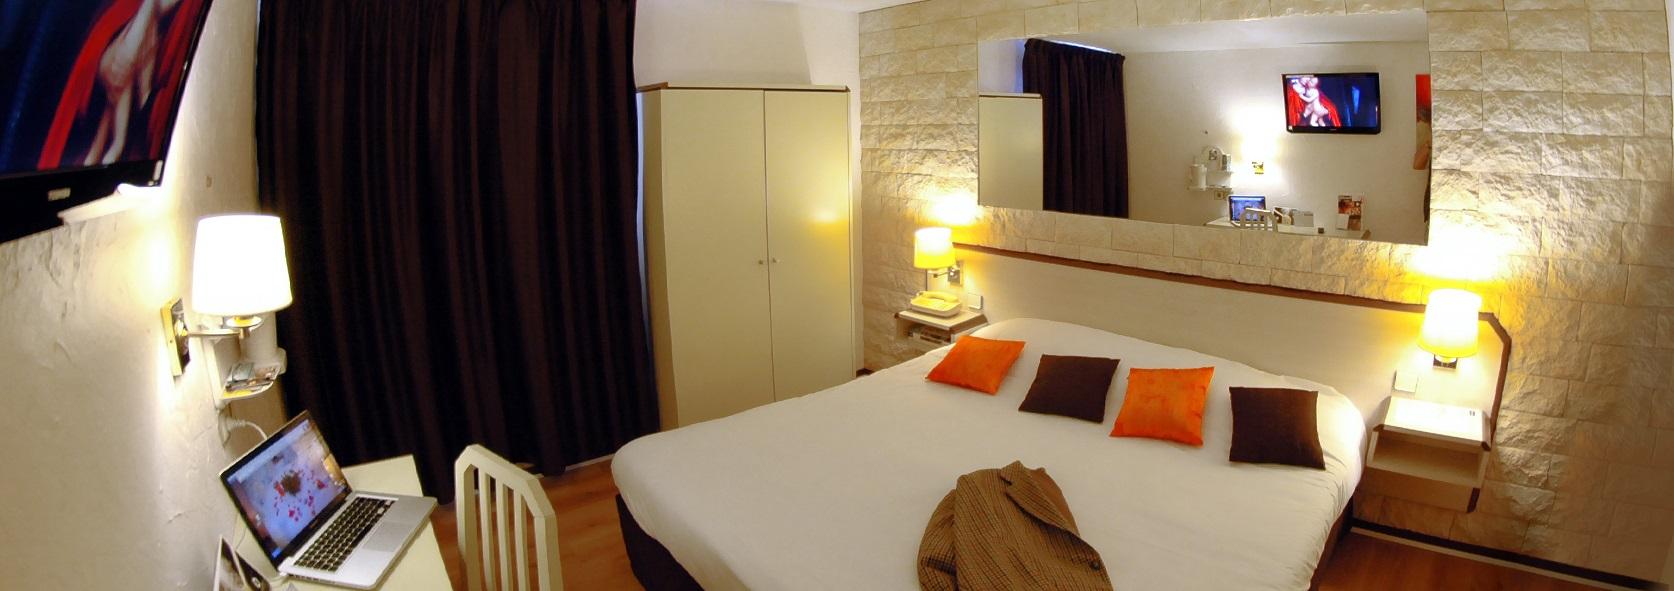 hotellogislerelaispaulons-chambre1